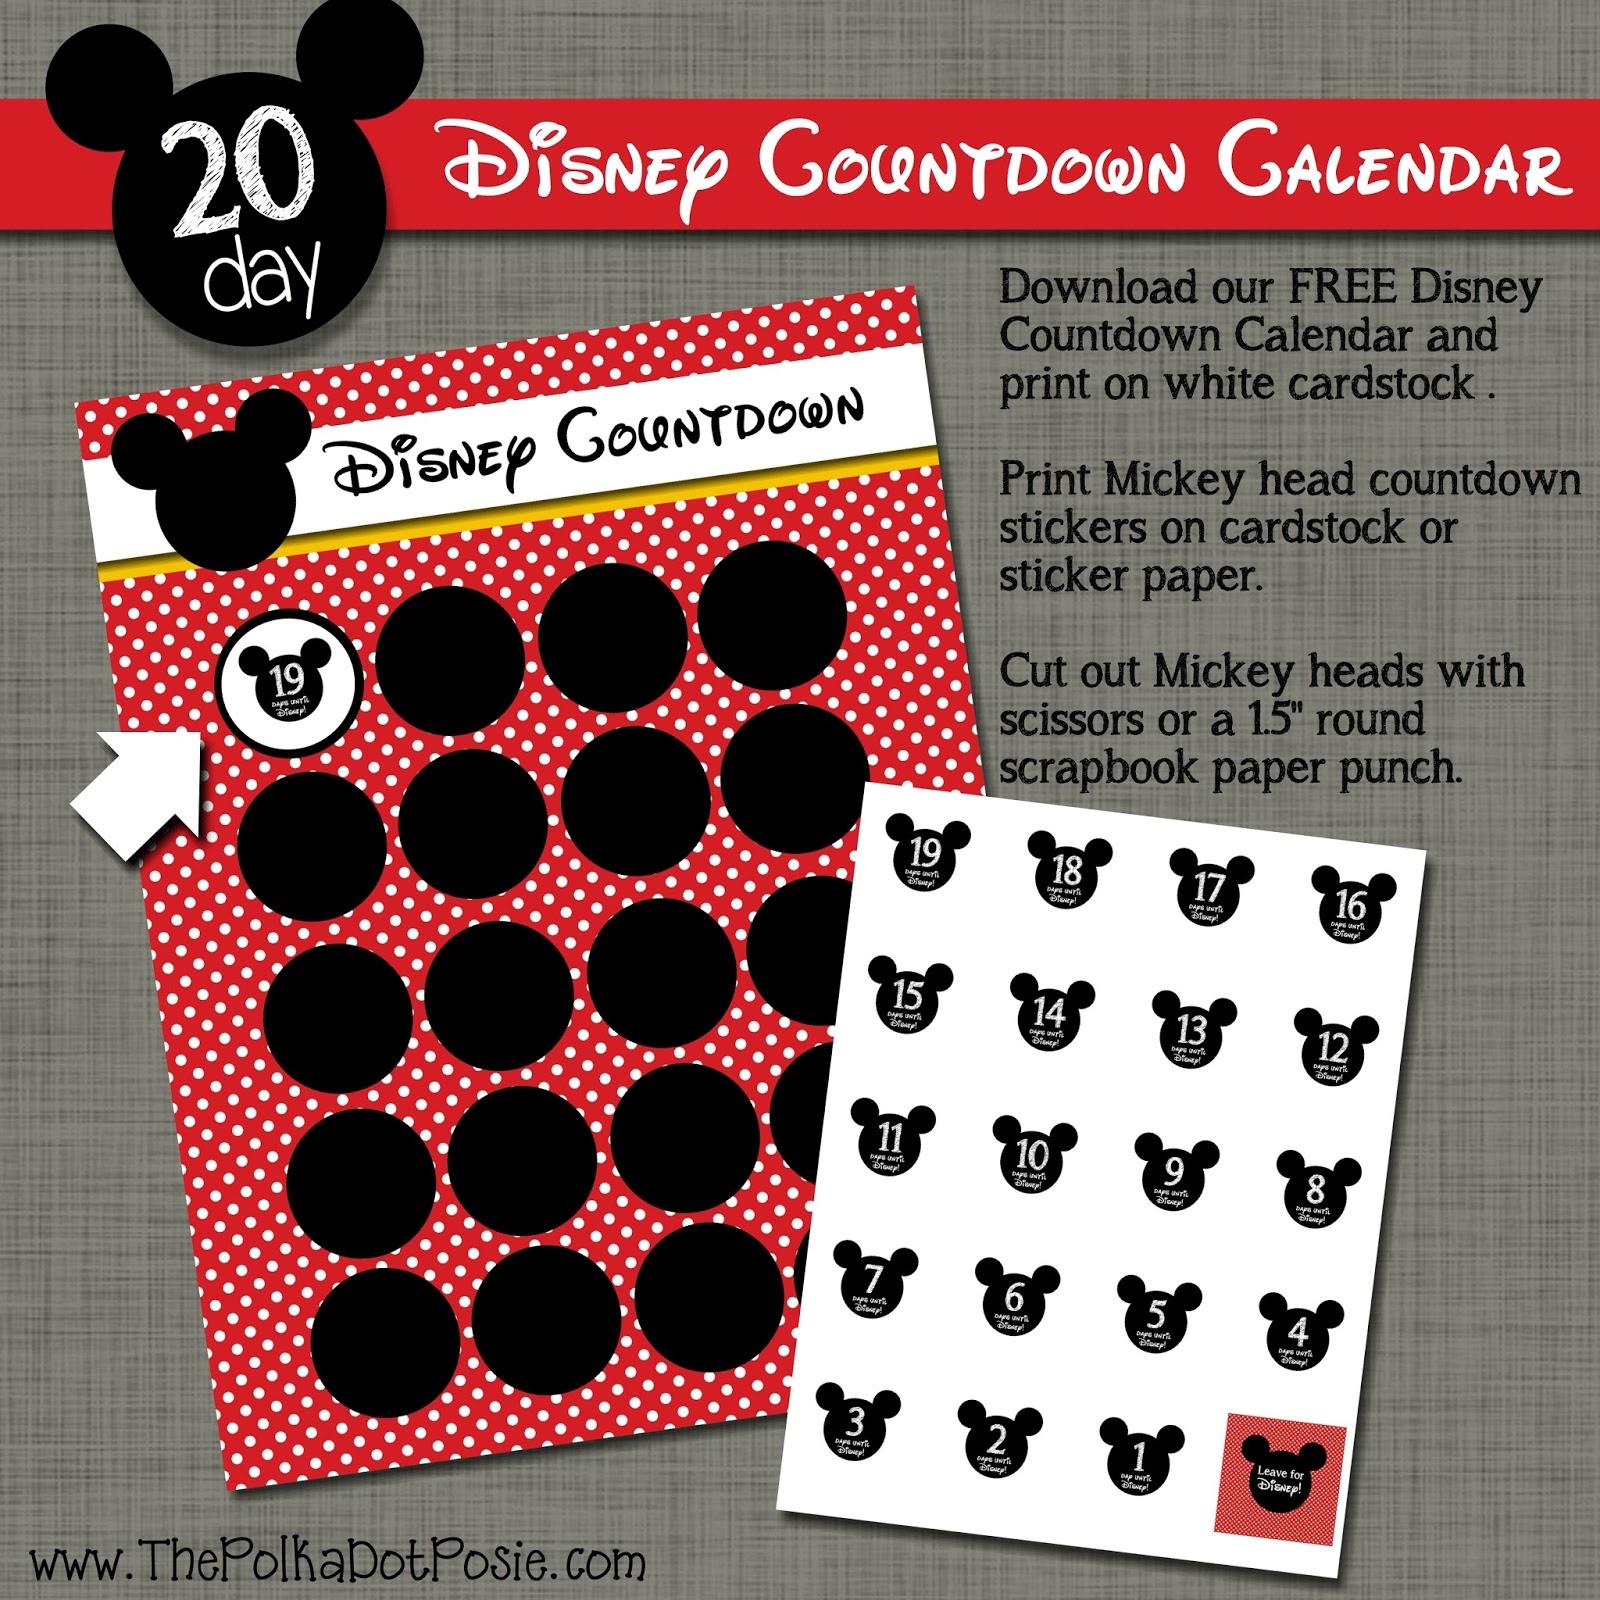 Disney Countdown Calendar Printable That Are Playful – Kelly for Disney World Countdown Calendar Printable